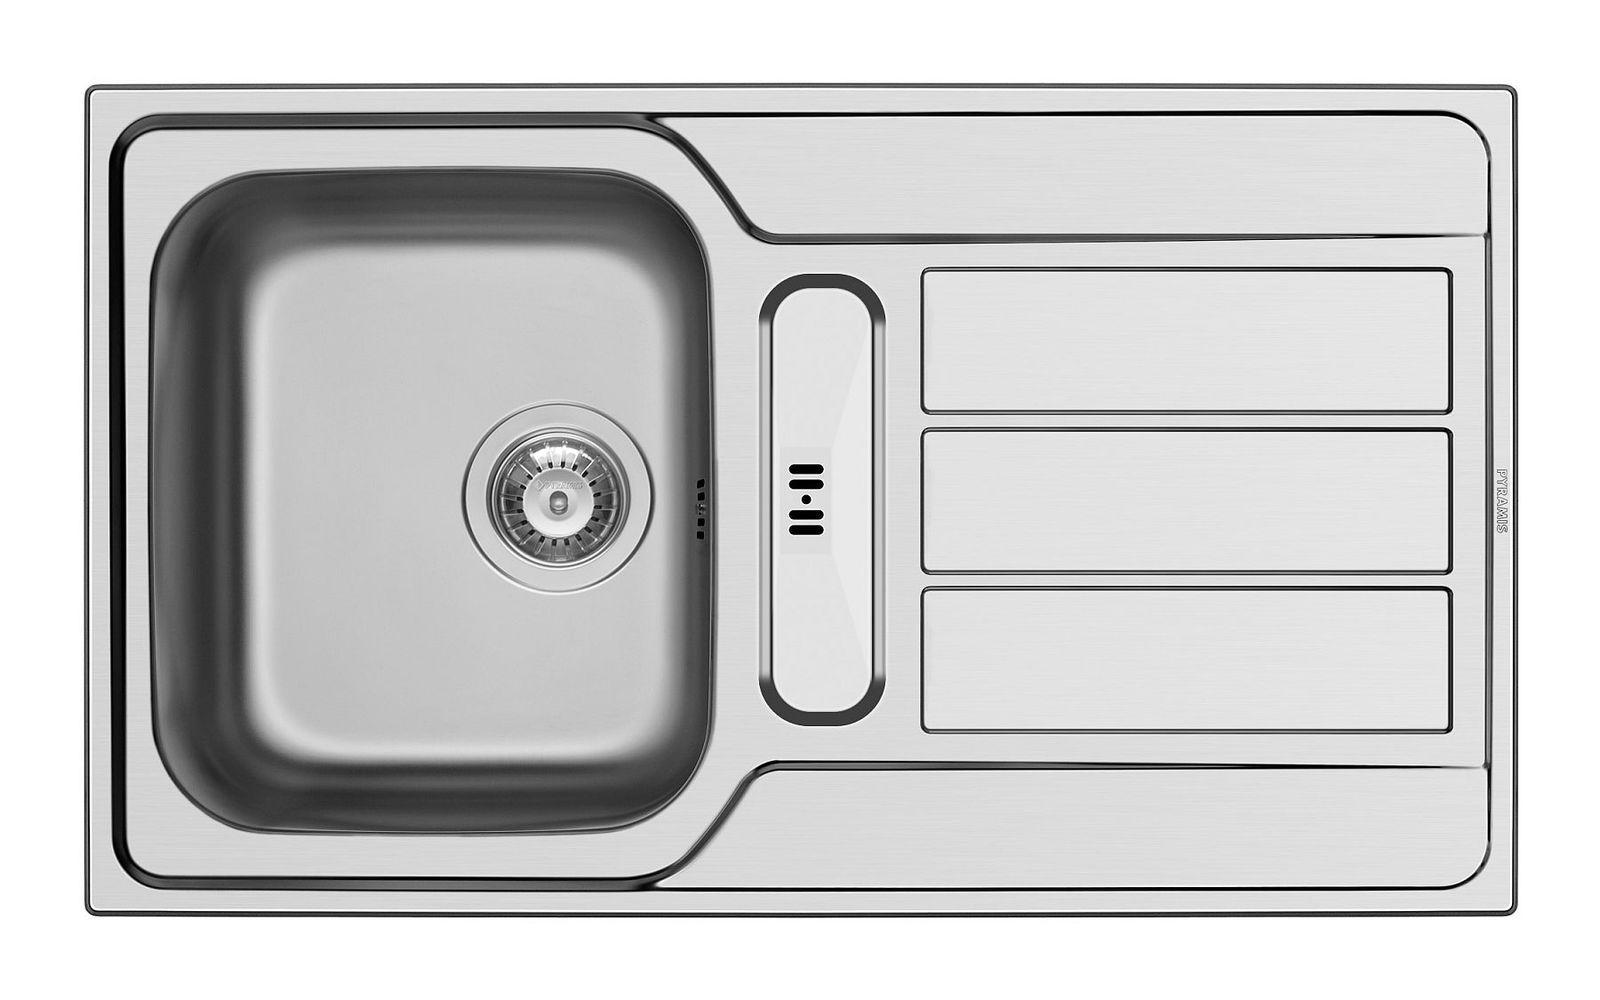 Edelstahl Küchenspüle 86 x 50 cm Spülbecken flächenbündig Flachrand ...